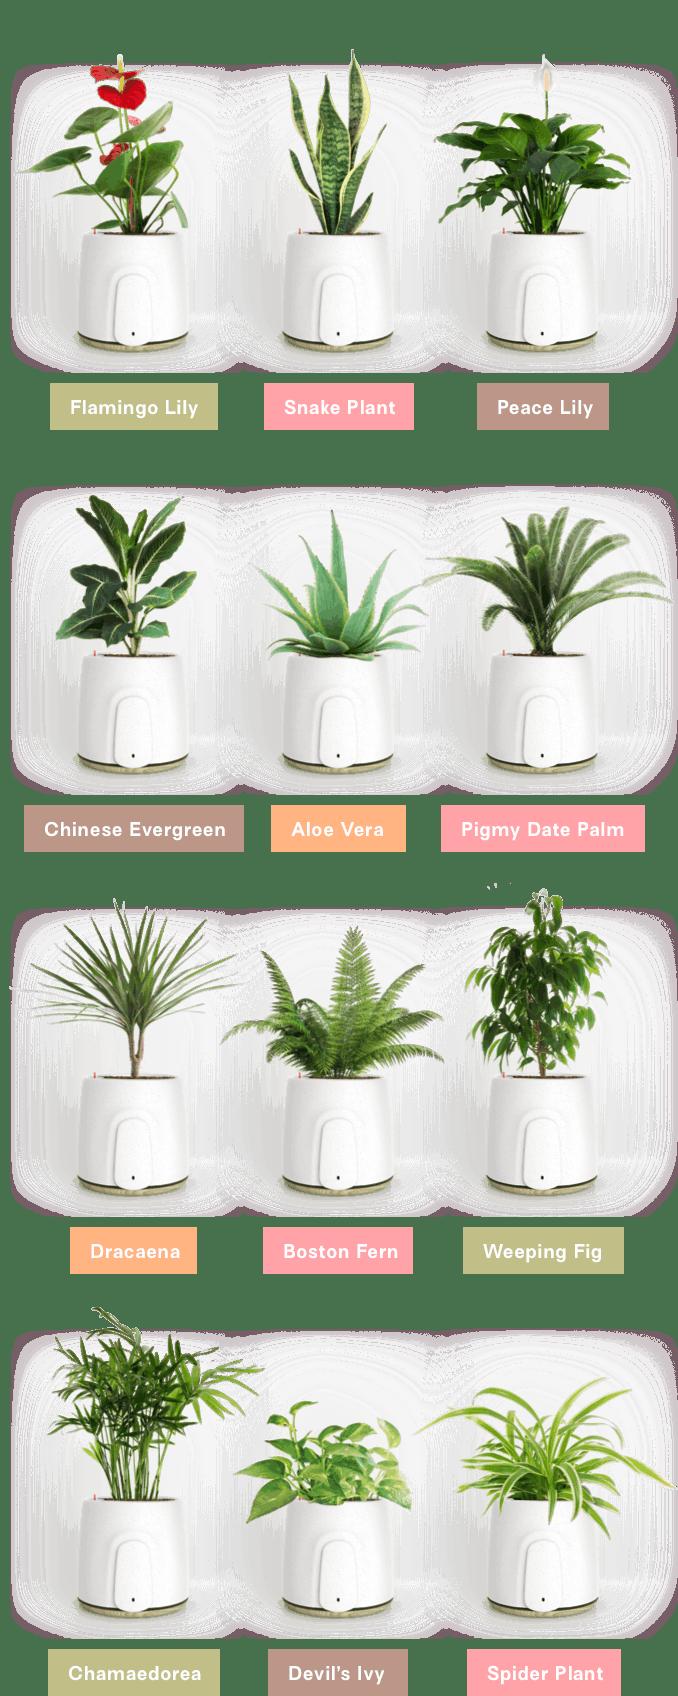 natede plants